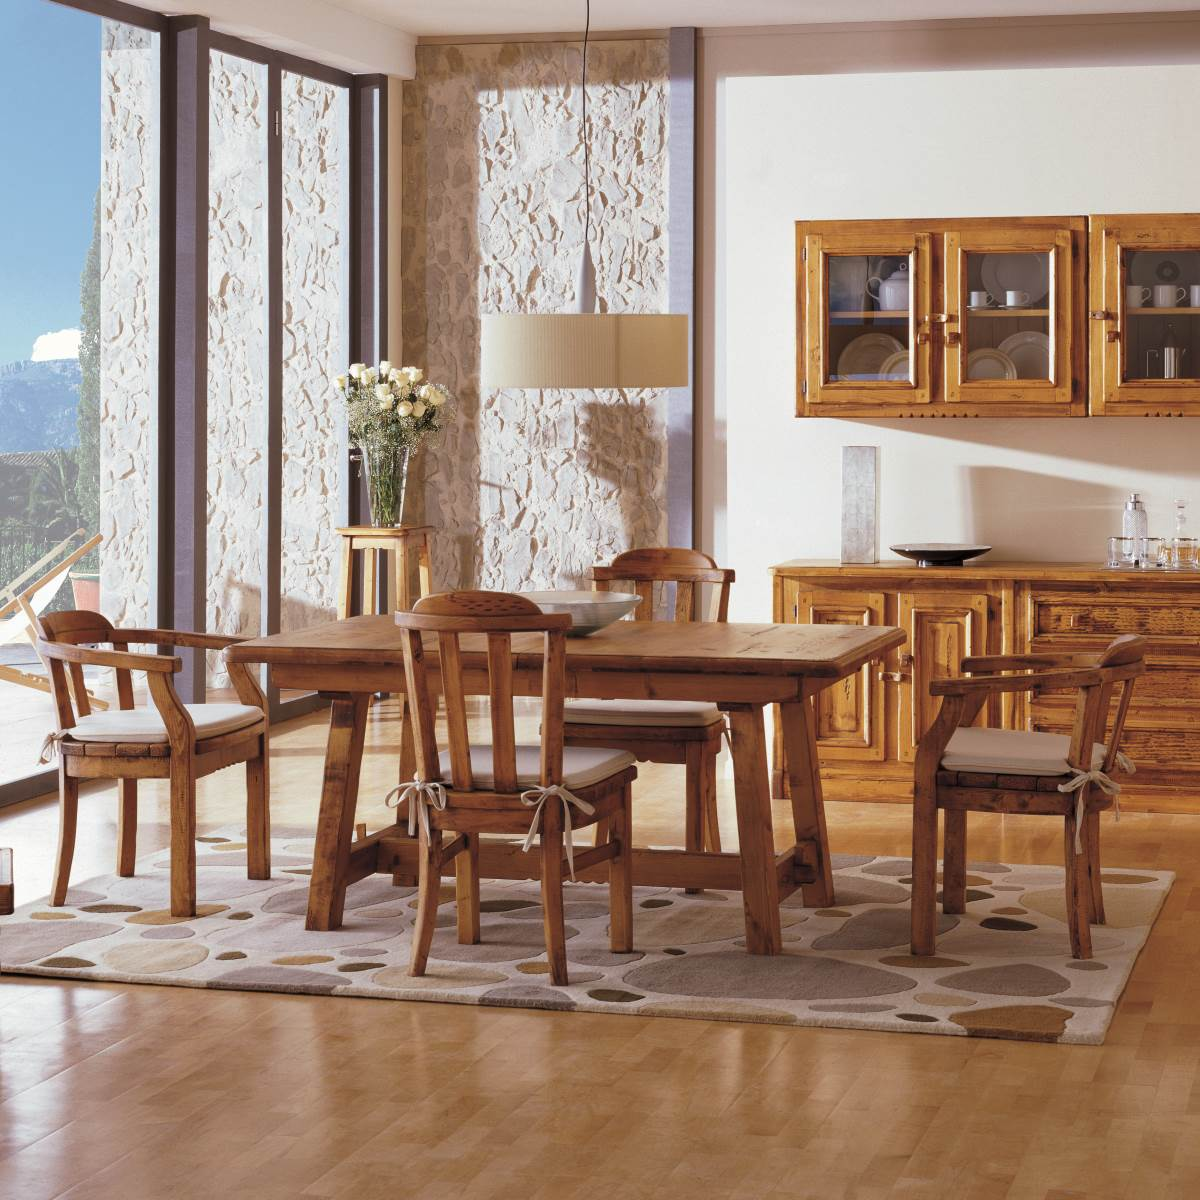 Mesa r stica 160 extensible ecor stico venta de muebles - Mesa comedor rustica extensible ...